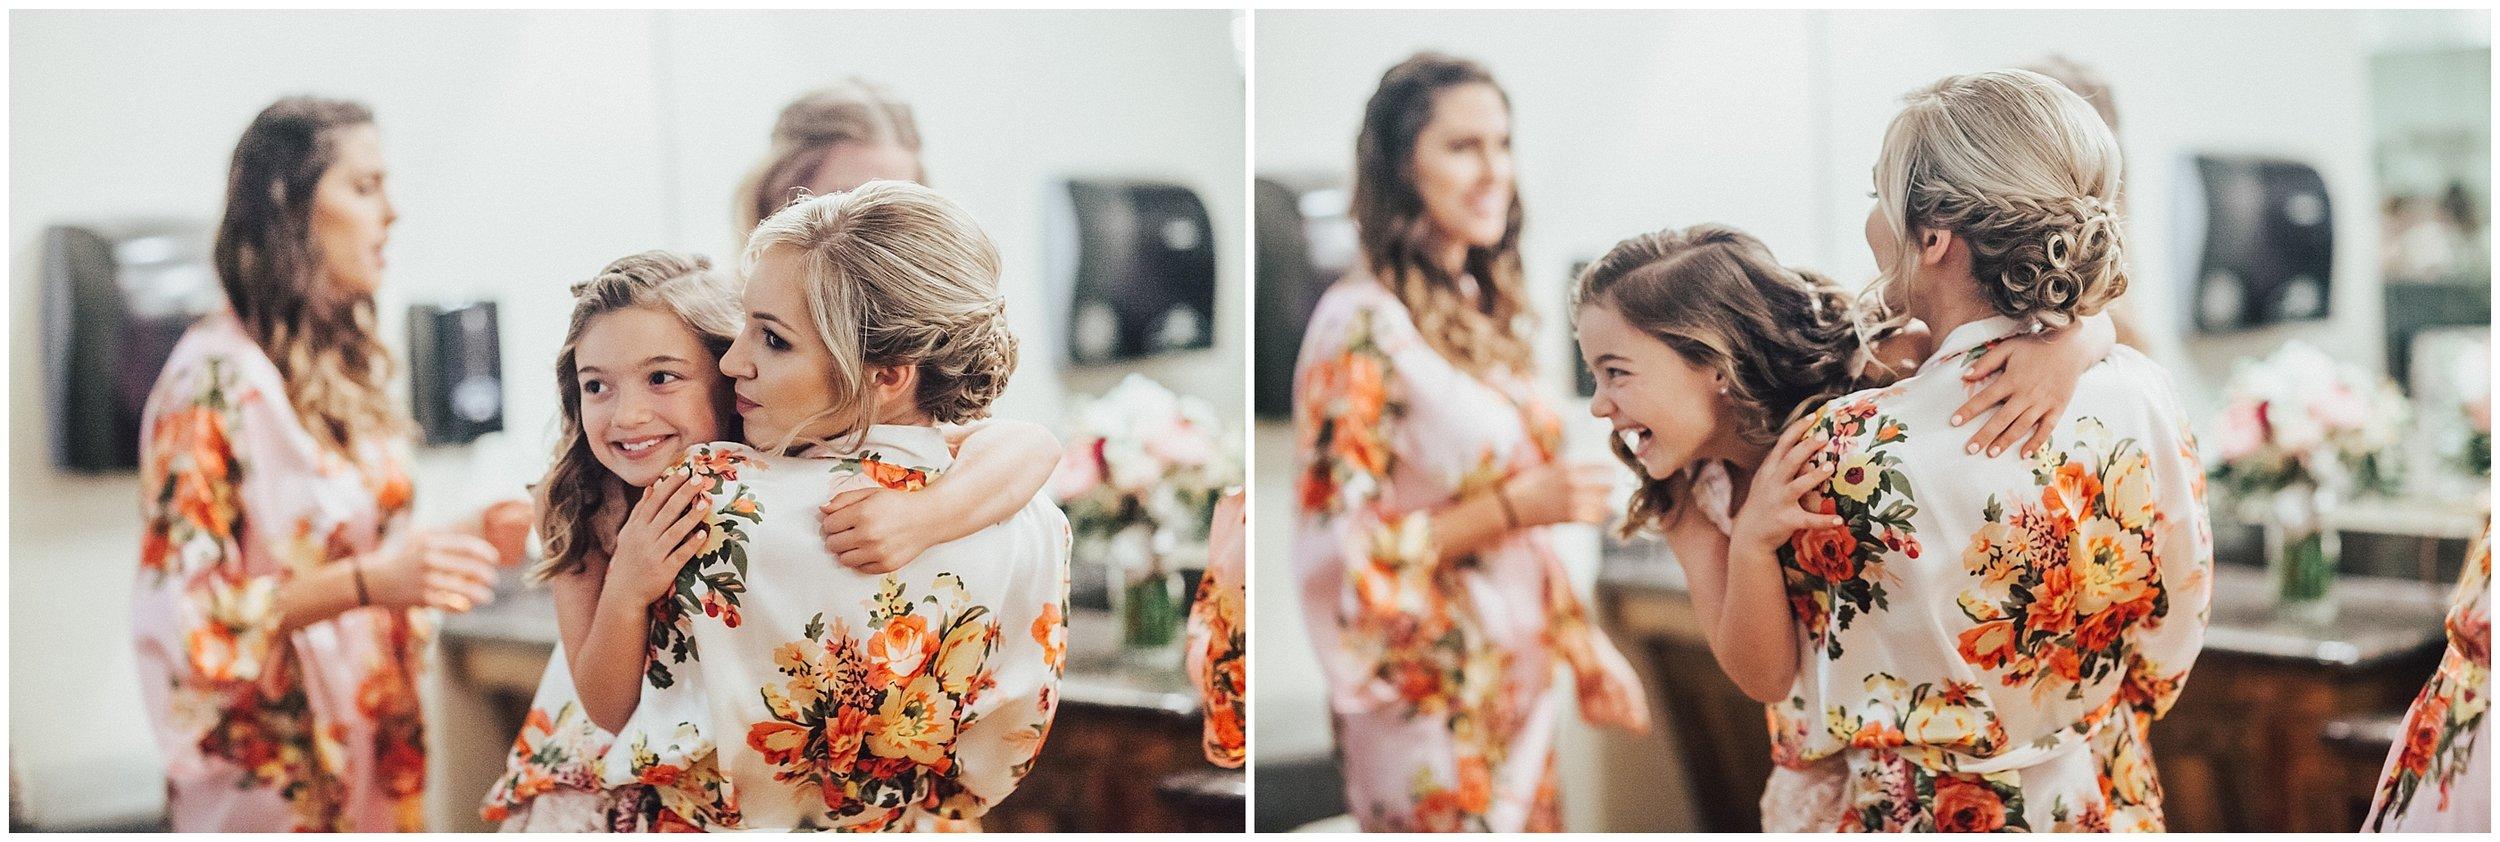 Madeleine Frost - Texas Wedding Photographer-1226.jpg